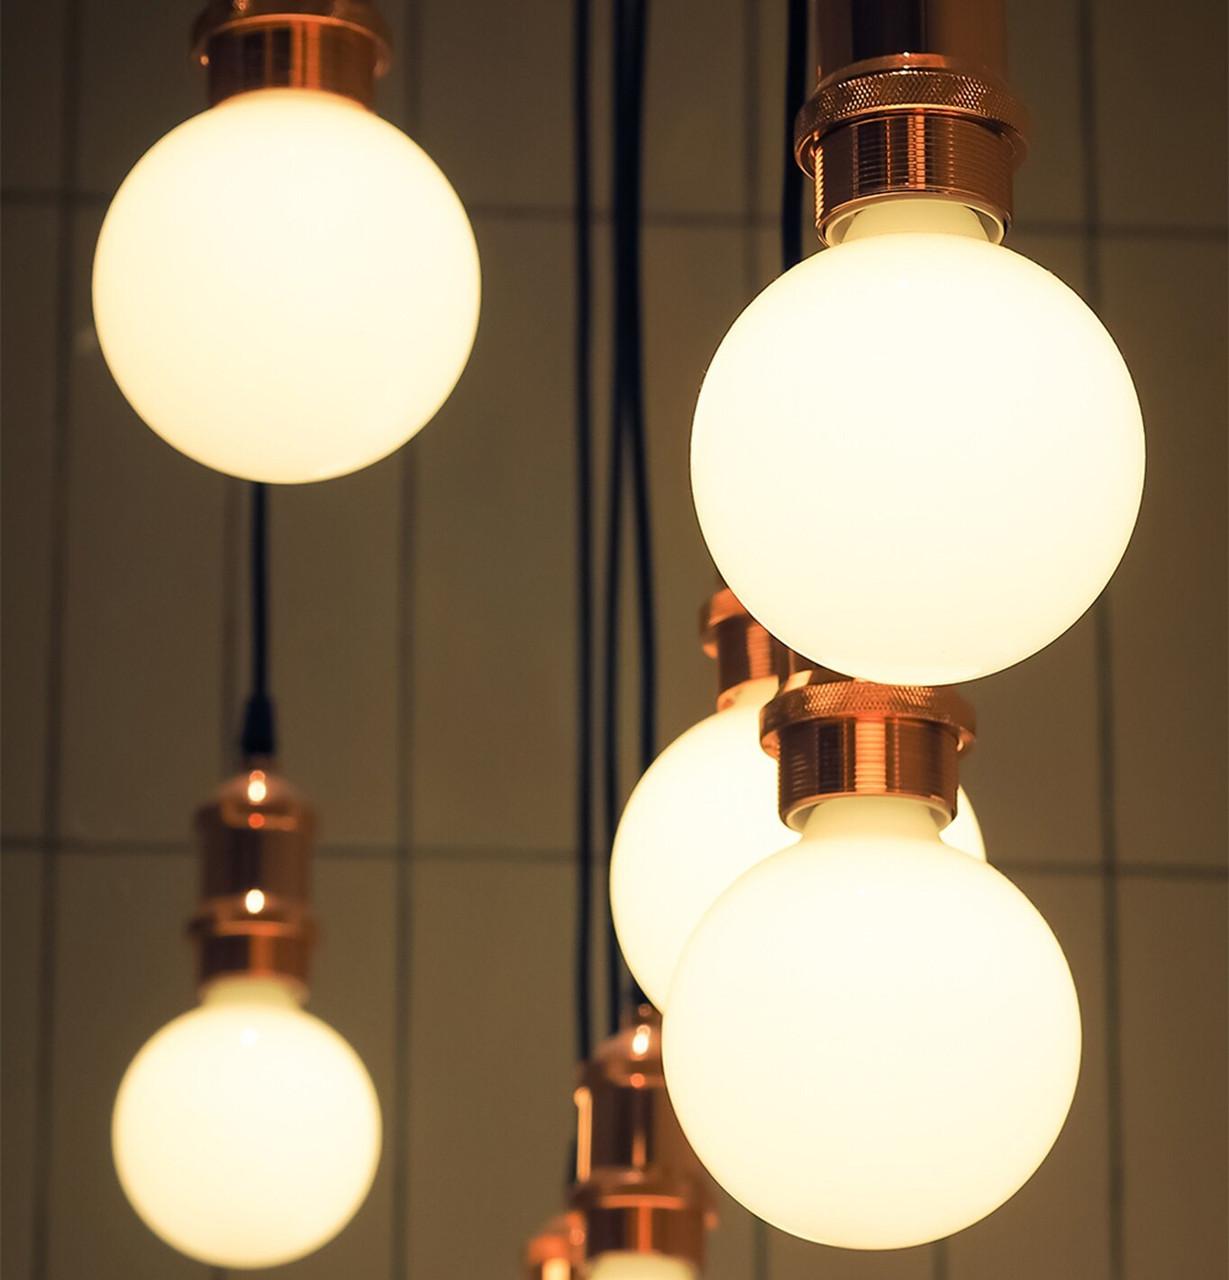 LED Globe E27 Light Bulbs